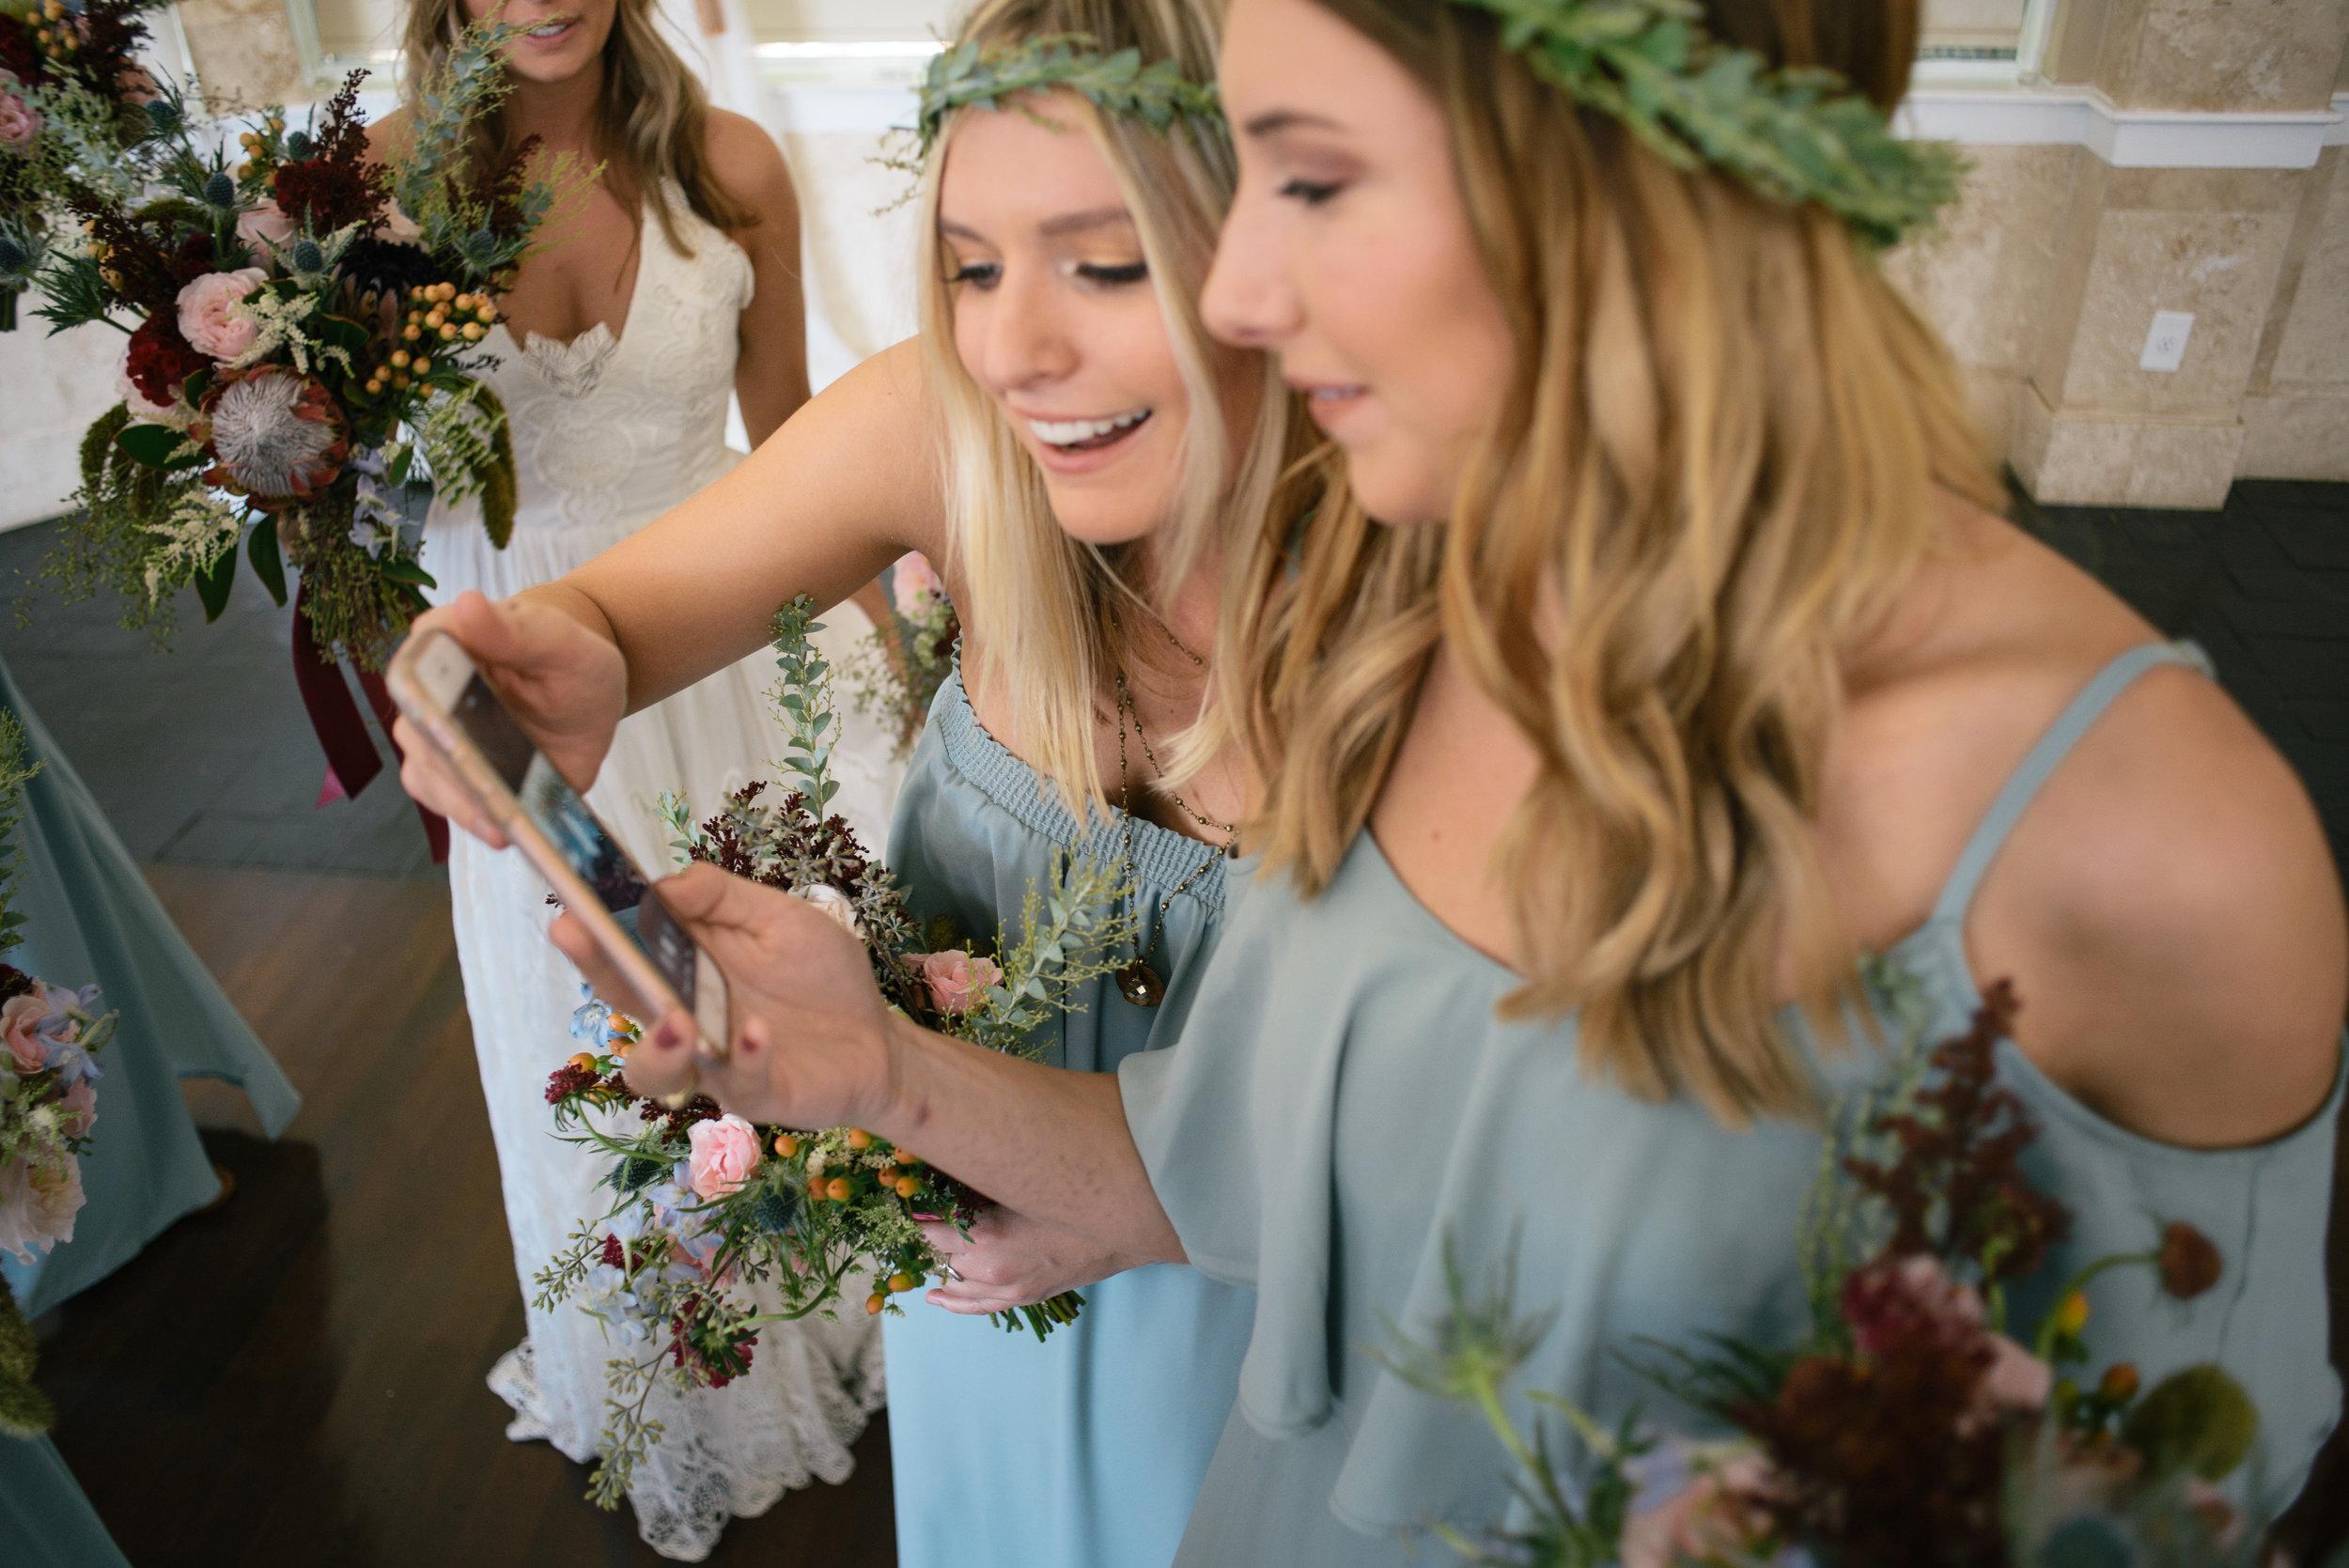 kristin-and-peter-atlanta-georgia-wedding-october-8th-2016 (7 of 1068).jpg